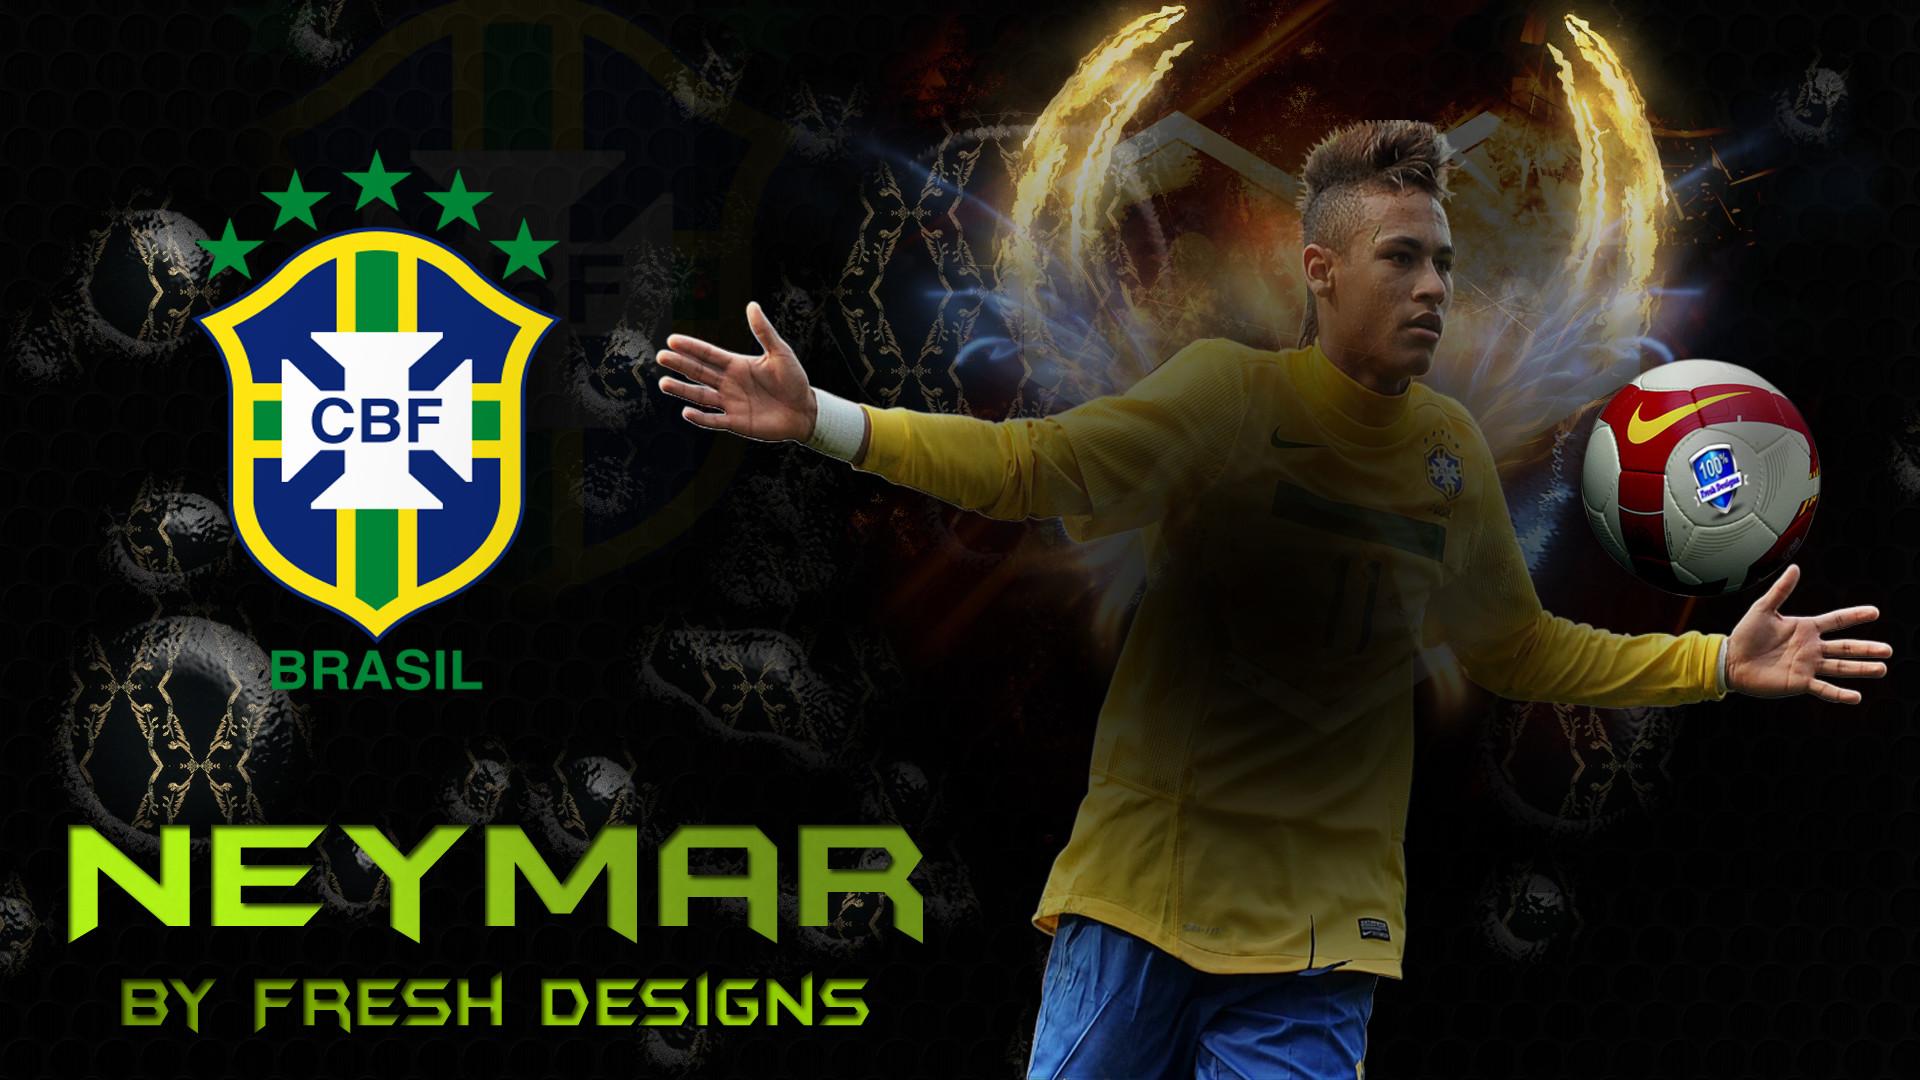 Download Neymar Wallpapers HD Wallpaper